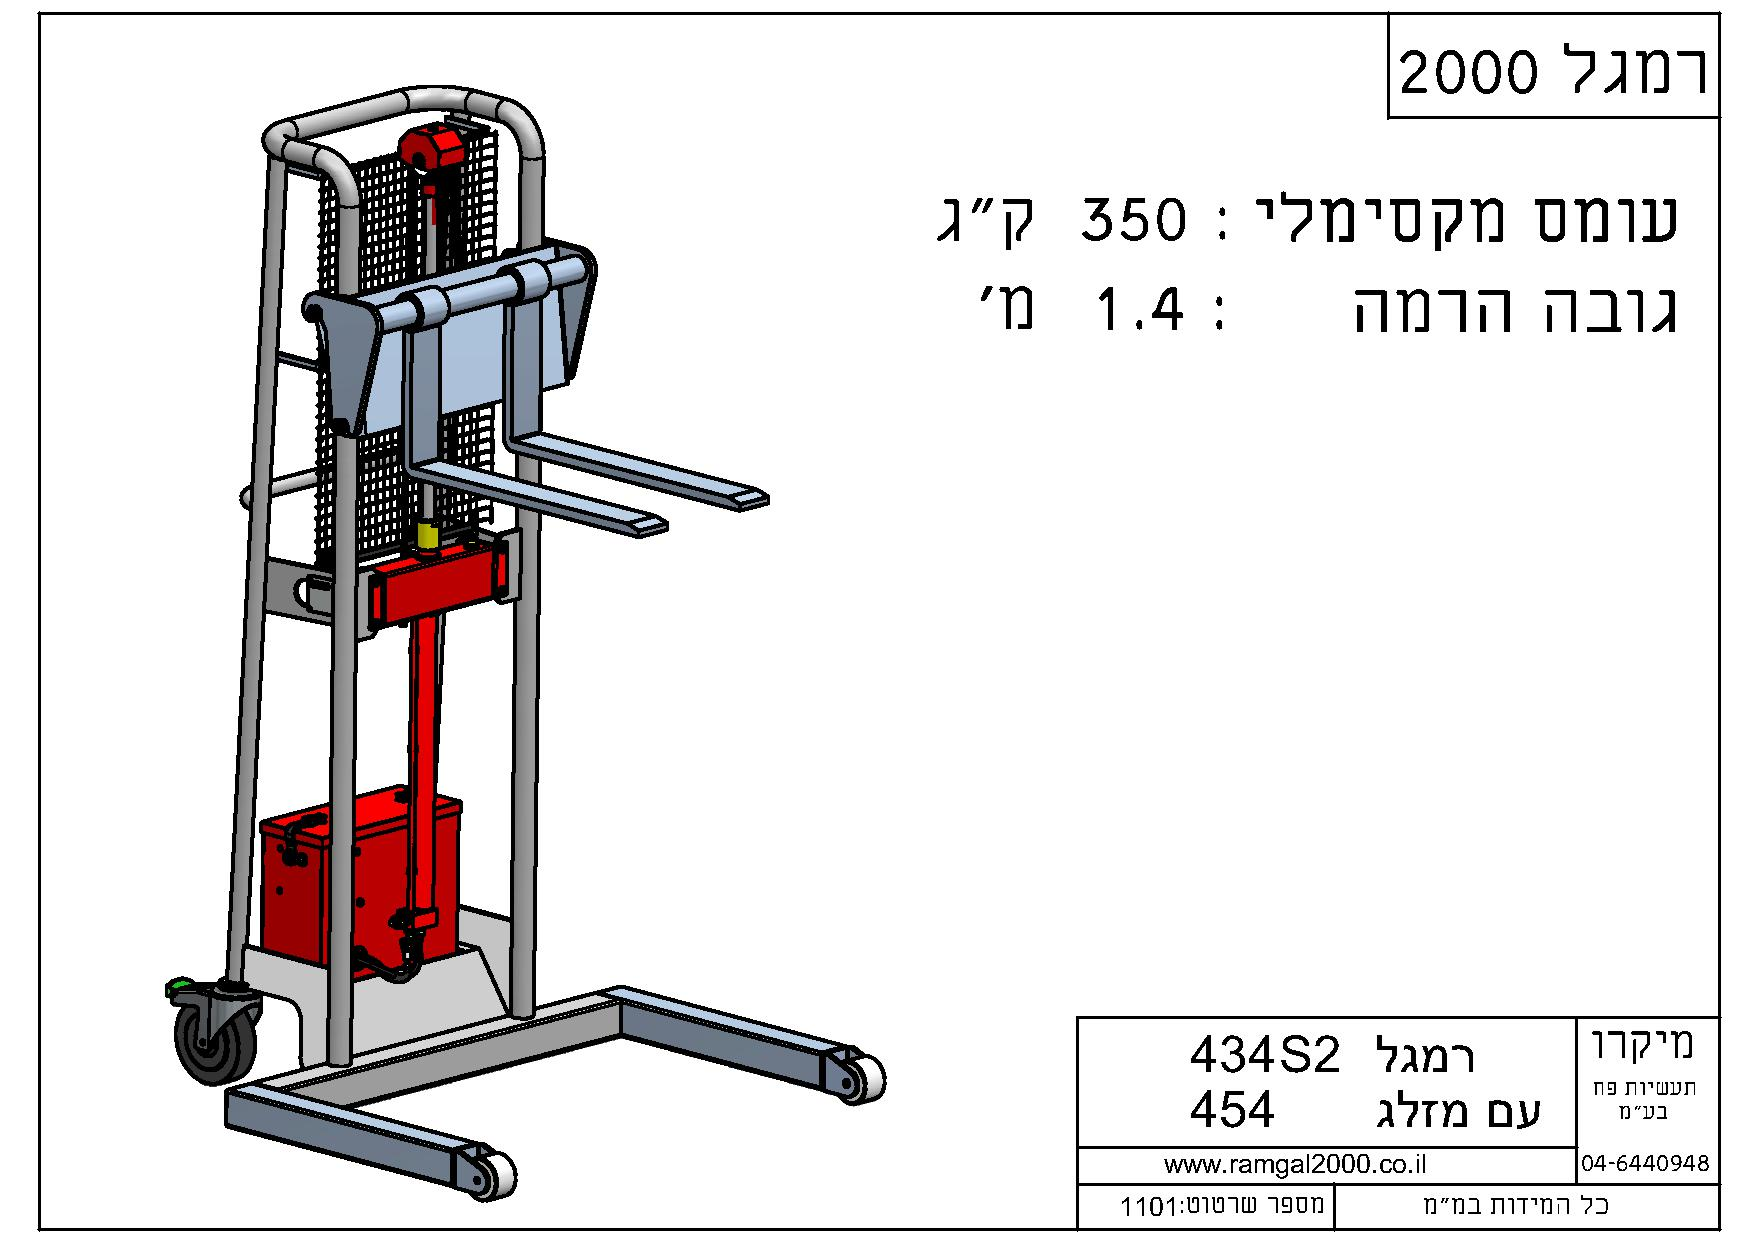 98-10434S2